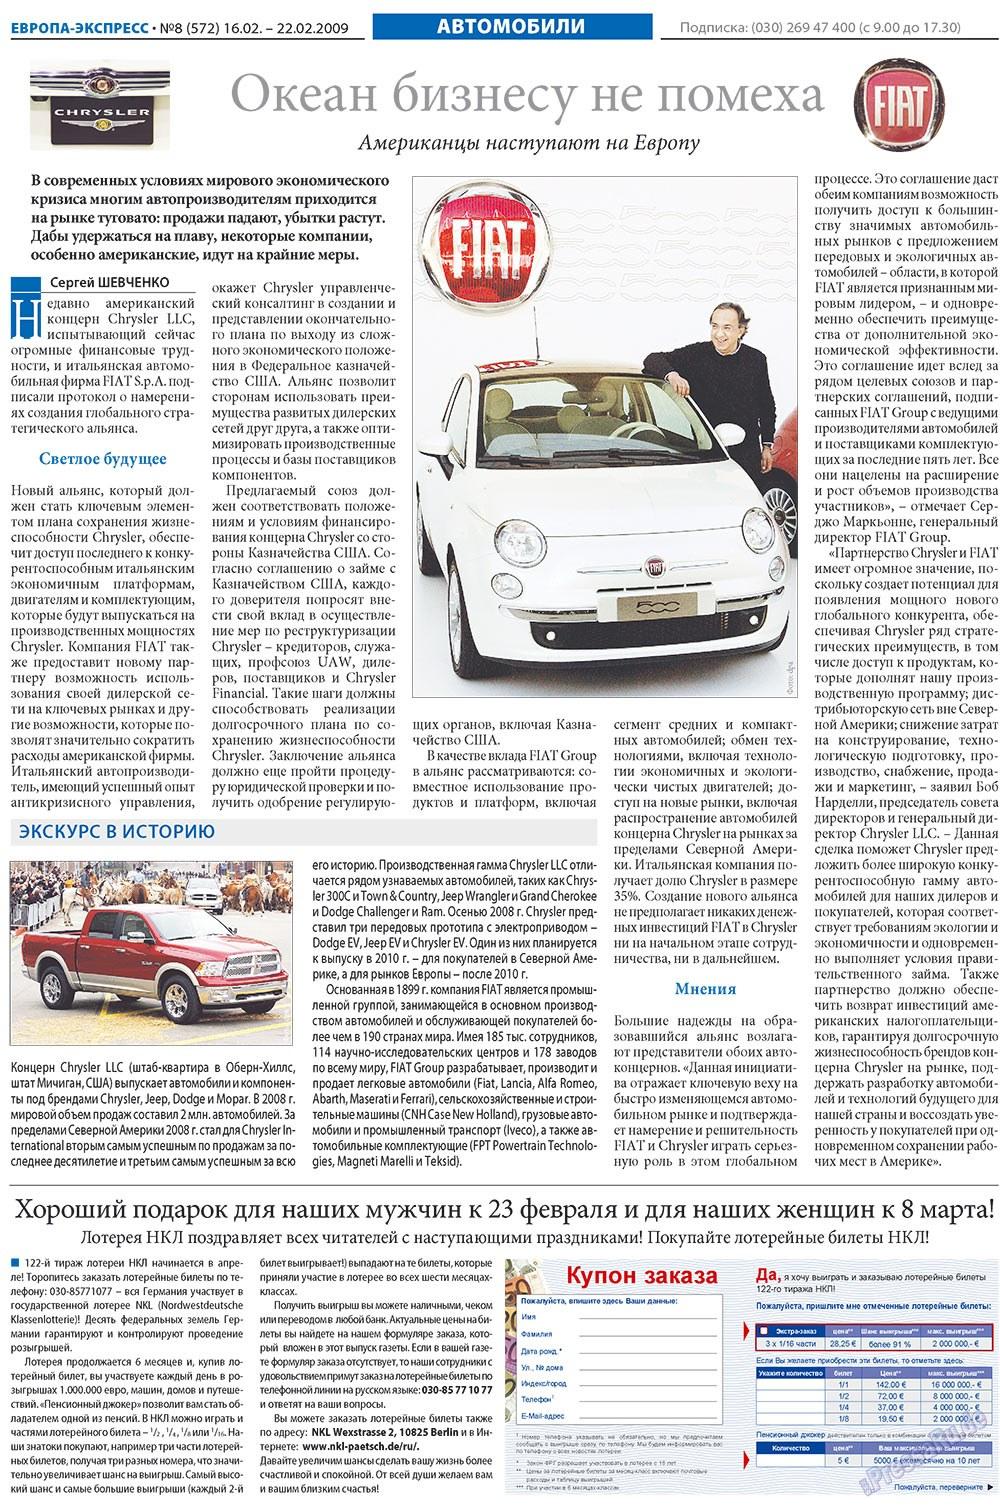 Европа экспресс (газета). 2009 год, номер 8, стр. 16